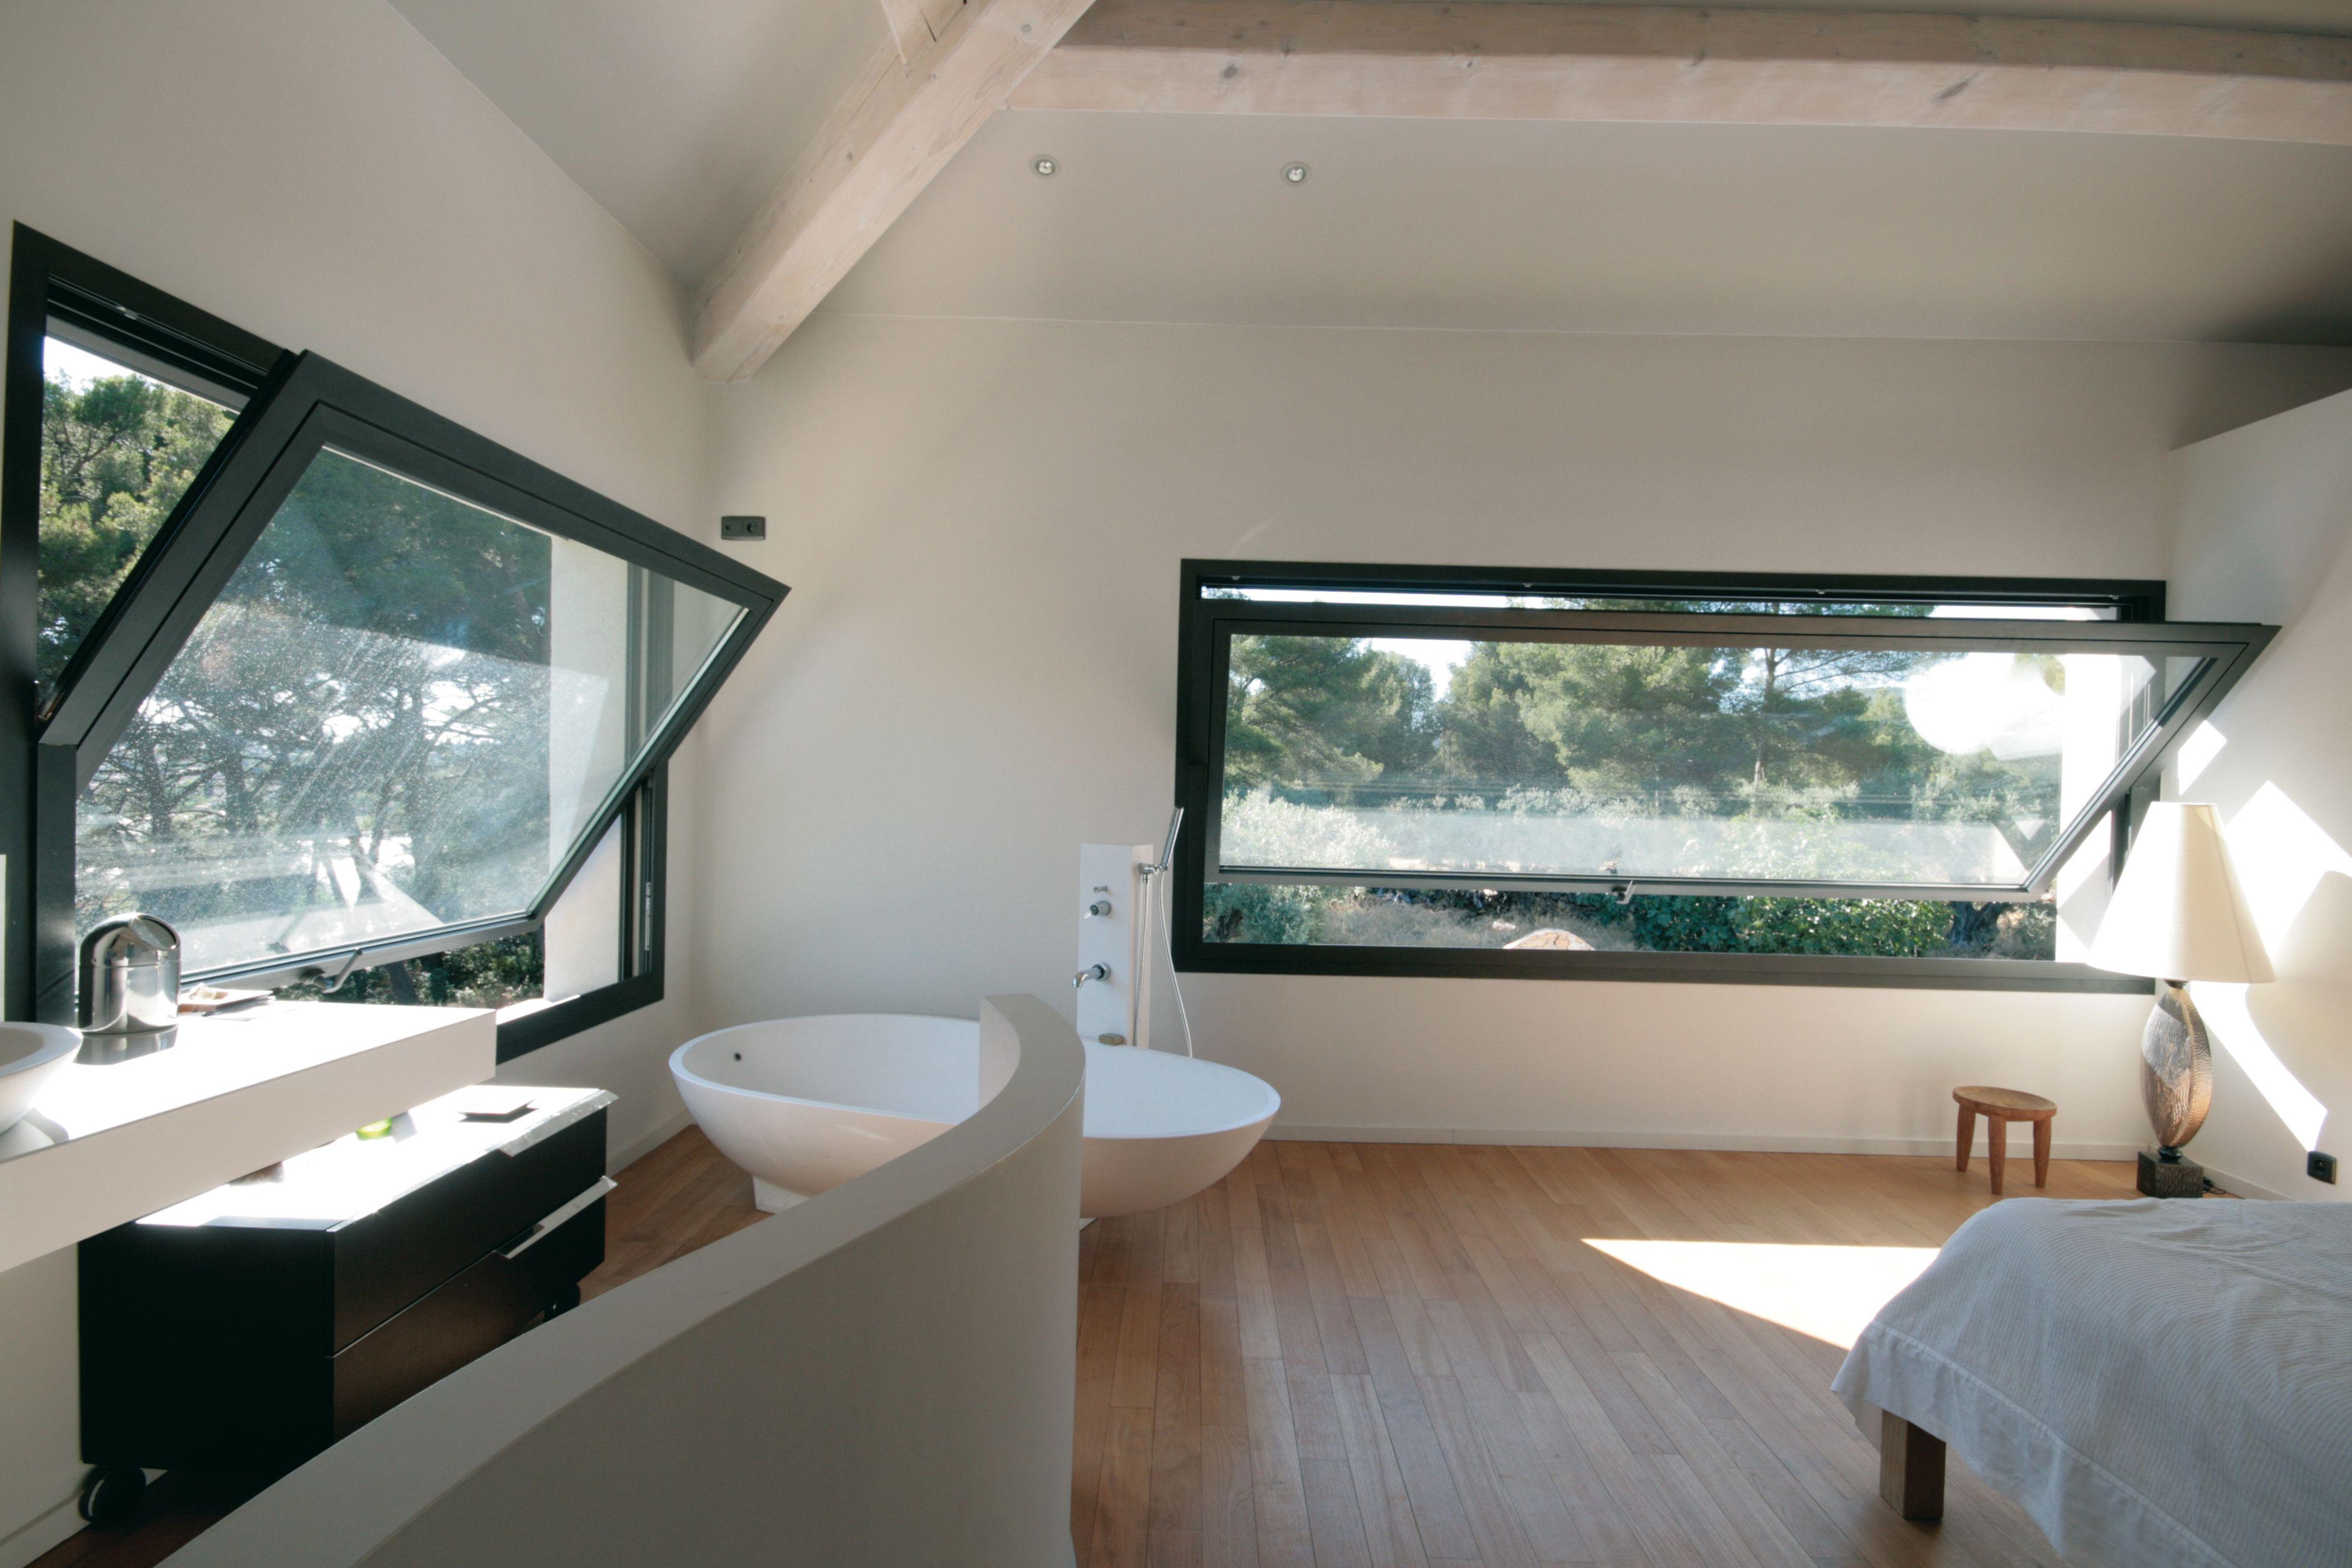 suite parentale avec salle de bain design. grande ouverture en ... - Salle De Bain Suite Parentale